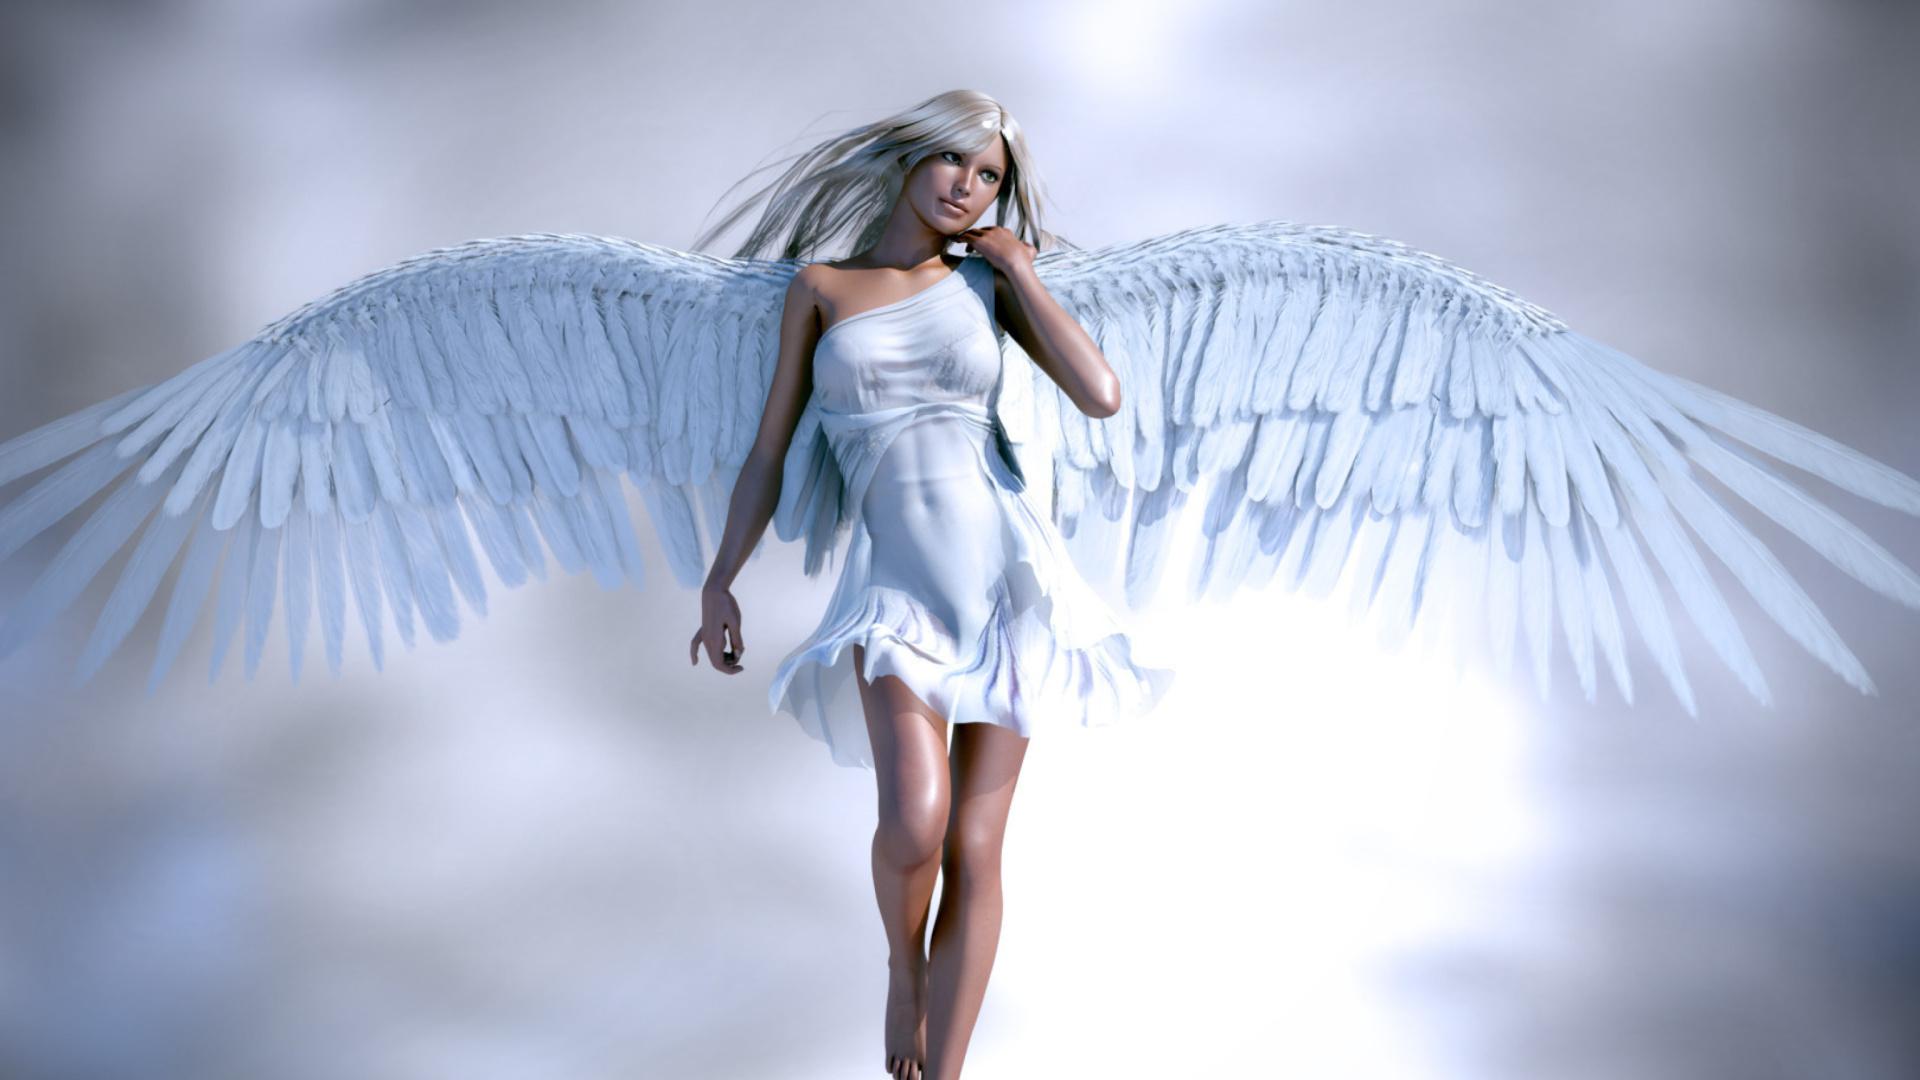 free 1920X1080 Angel 3D 1920x1080 wallpaper screensaver preview id 1920x1080